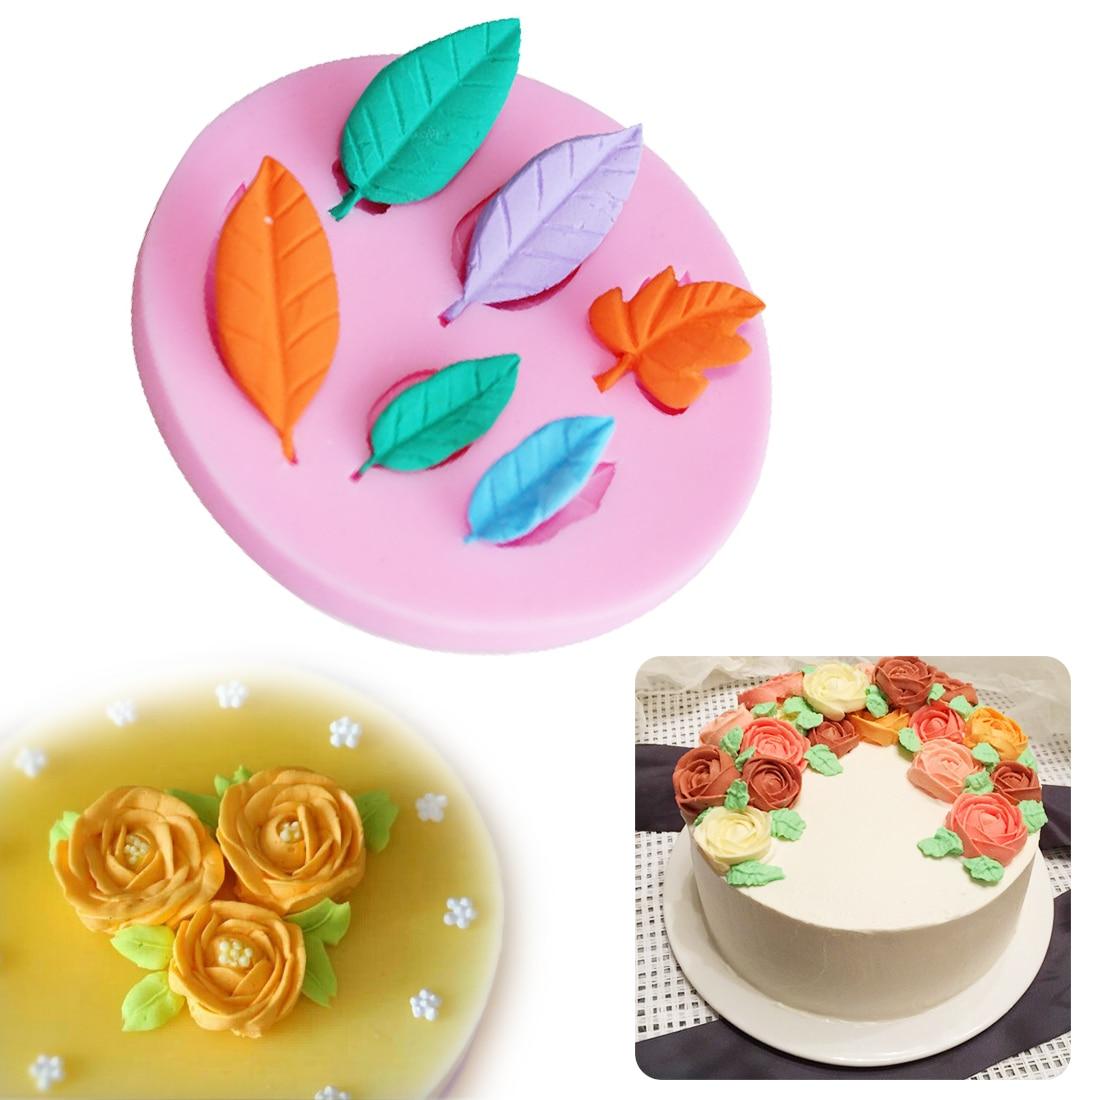 3D Silicone Hardware Tools Shape Fondant Mould Cake Decor Baking Pastry DIY Mold